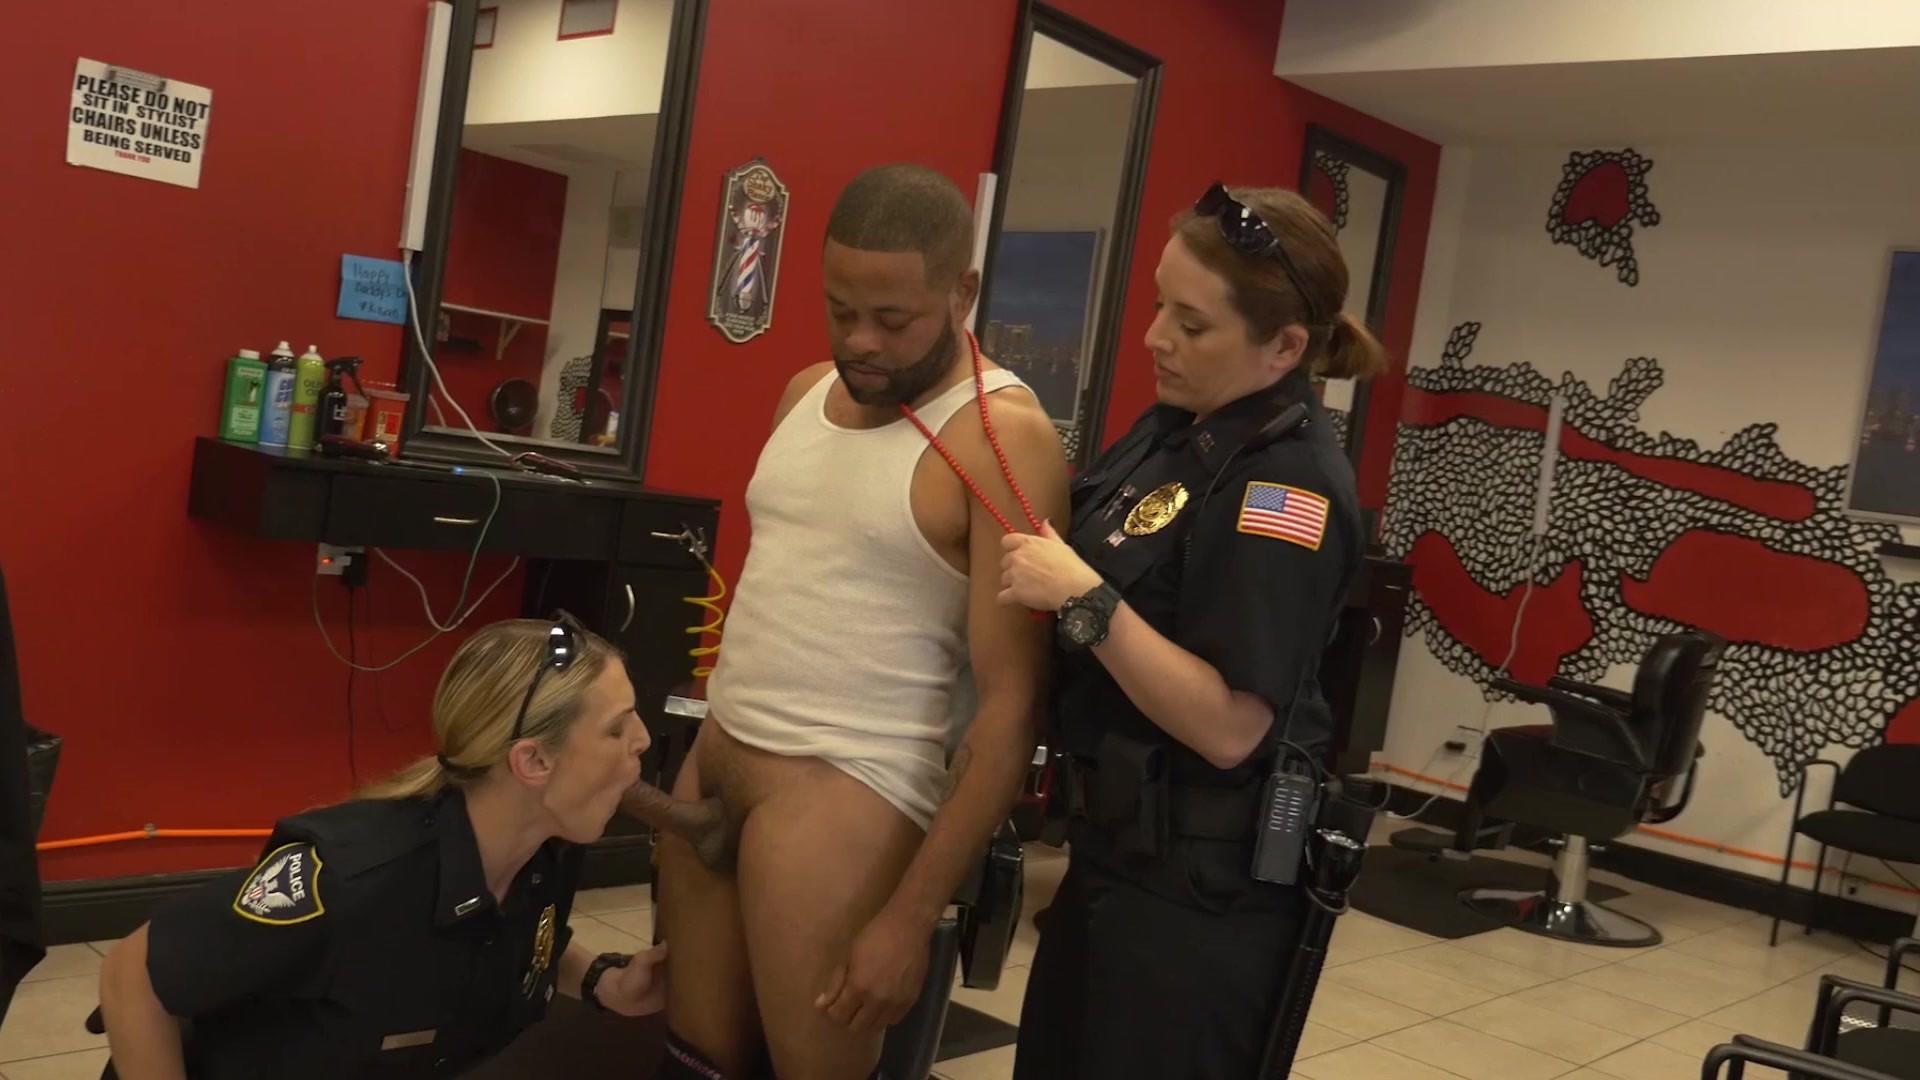 Super hot latina cop get fucked with tongue and big cock